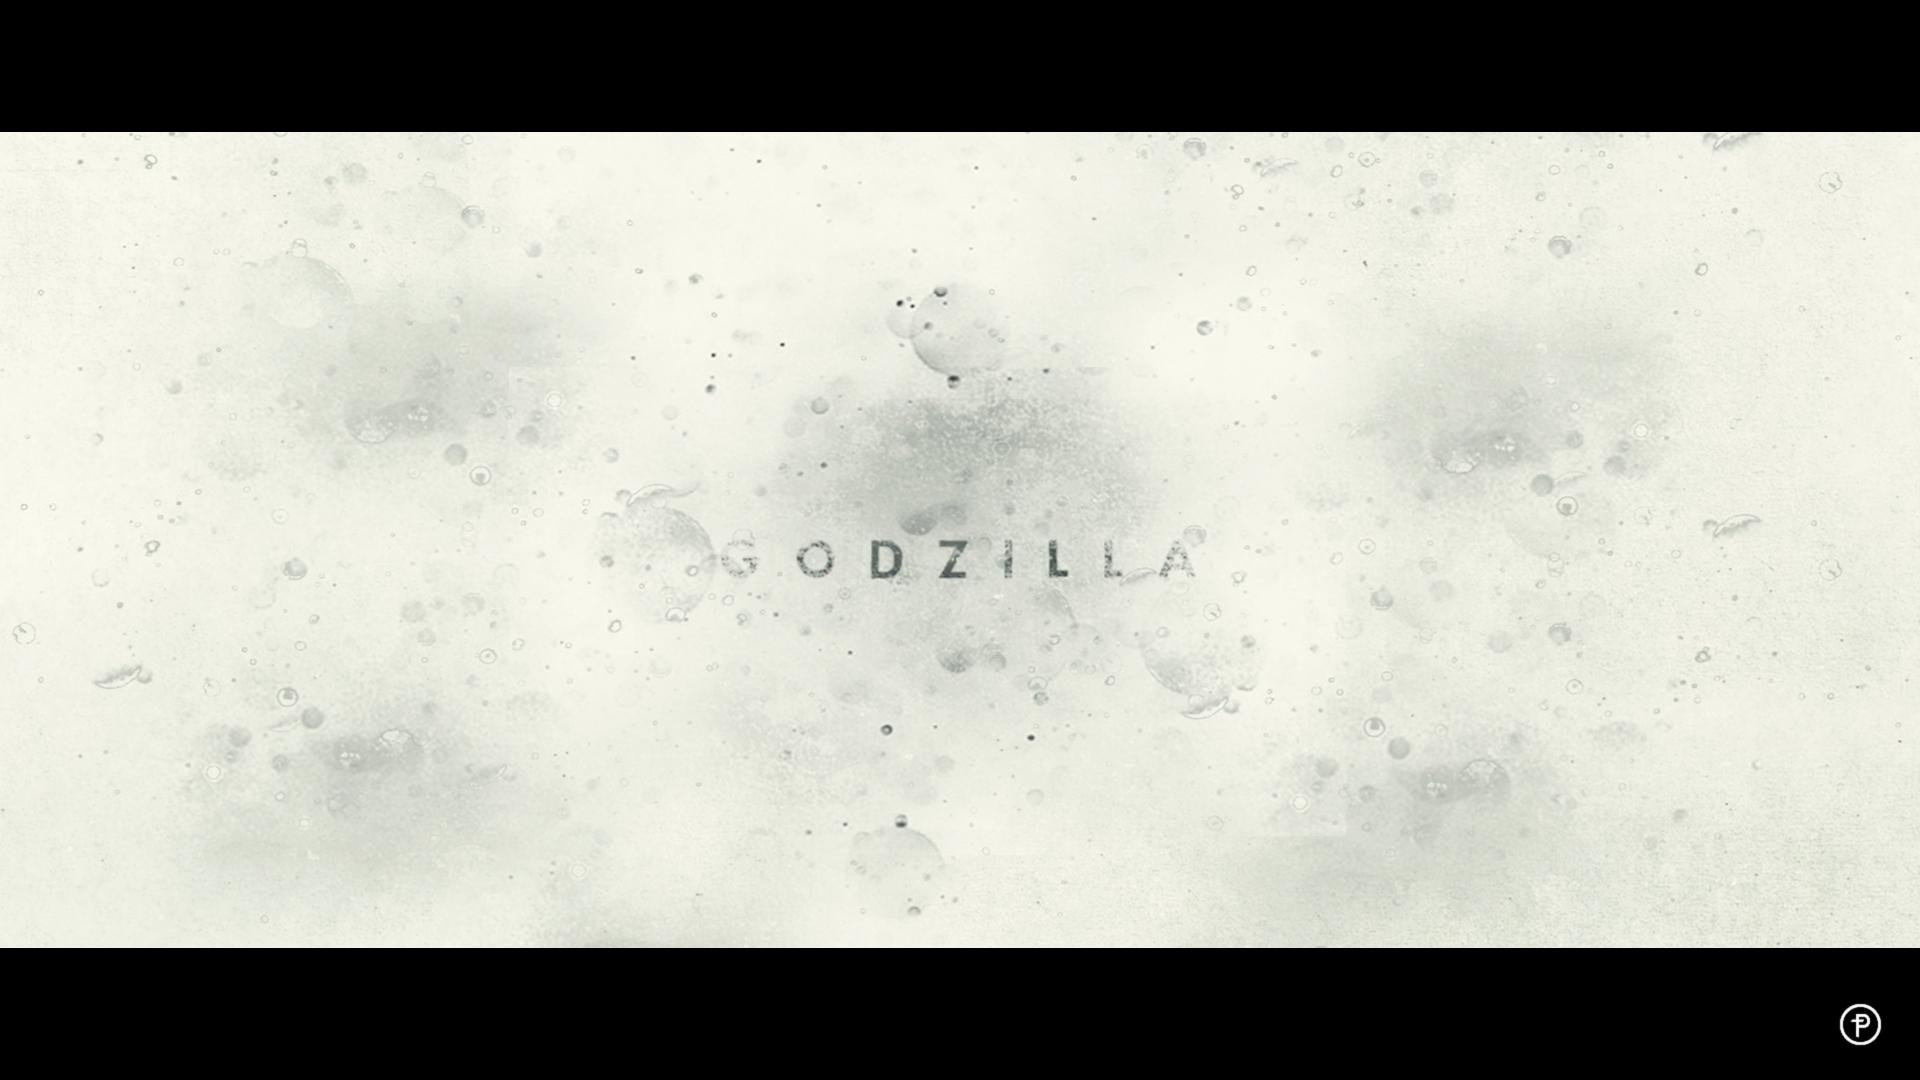 GODZILLA_WM_01.jpg